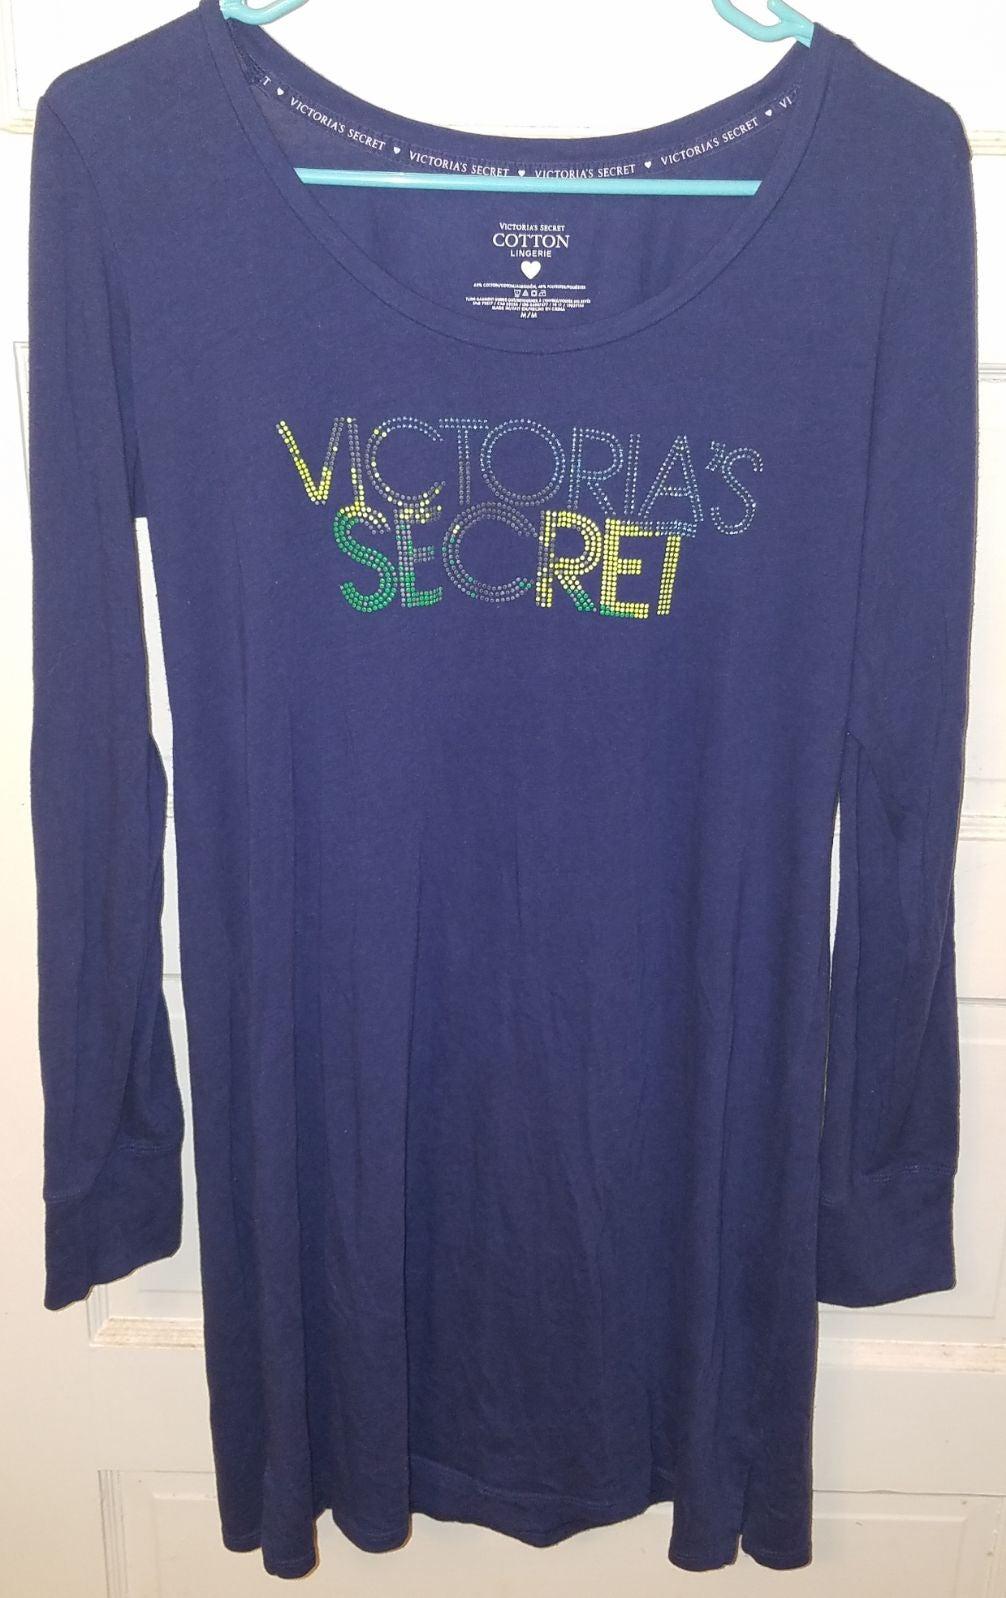 Victoria's Secret Cotton Sleep Shirt siz